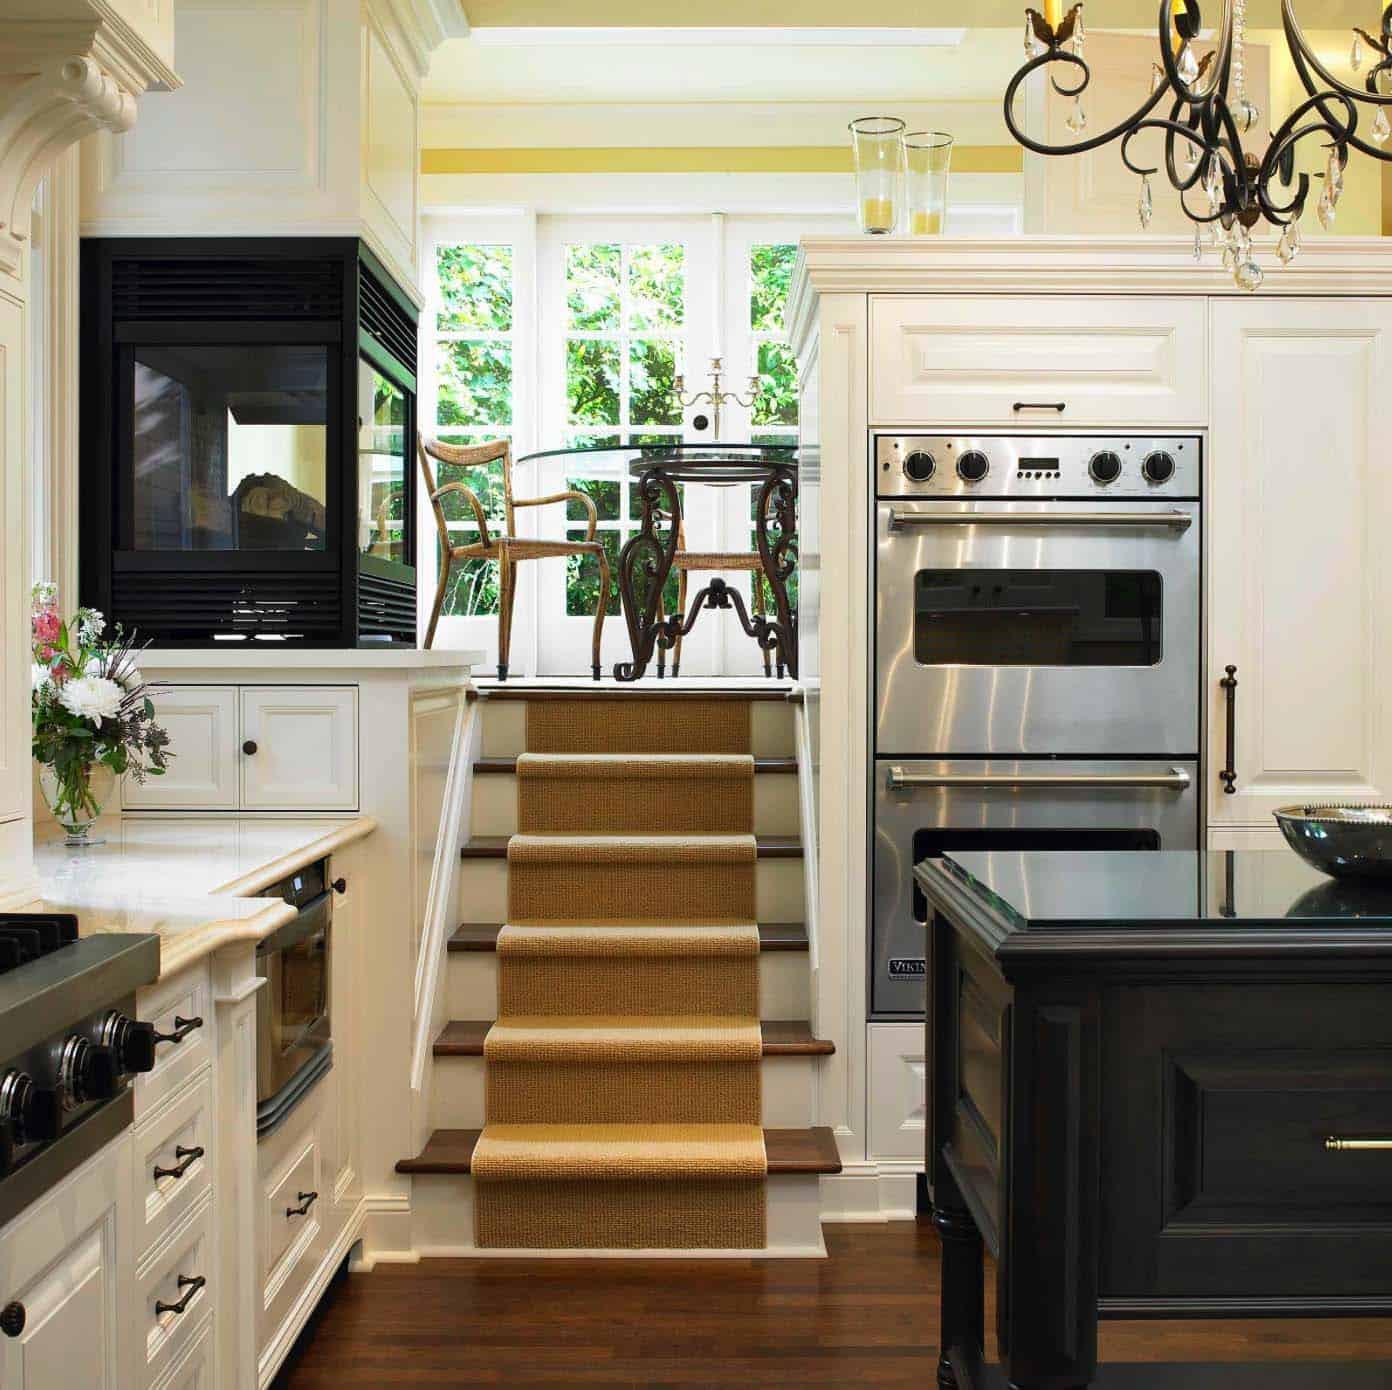 Kitchen Showcasing Cozy Fireplace-14-1 Kindesign